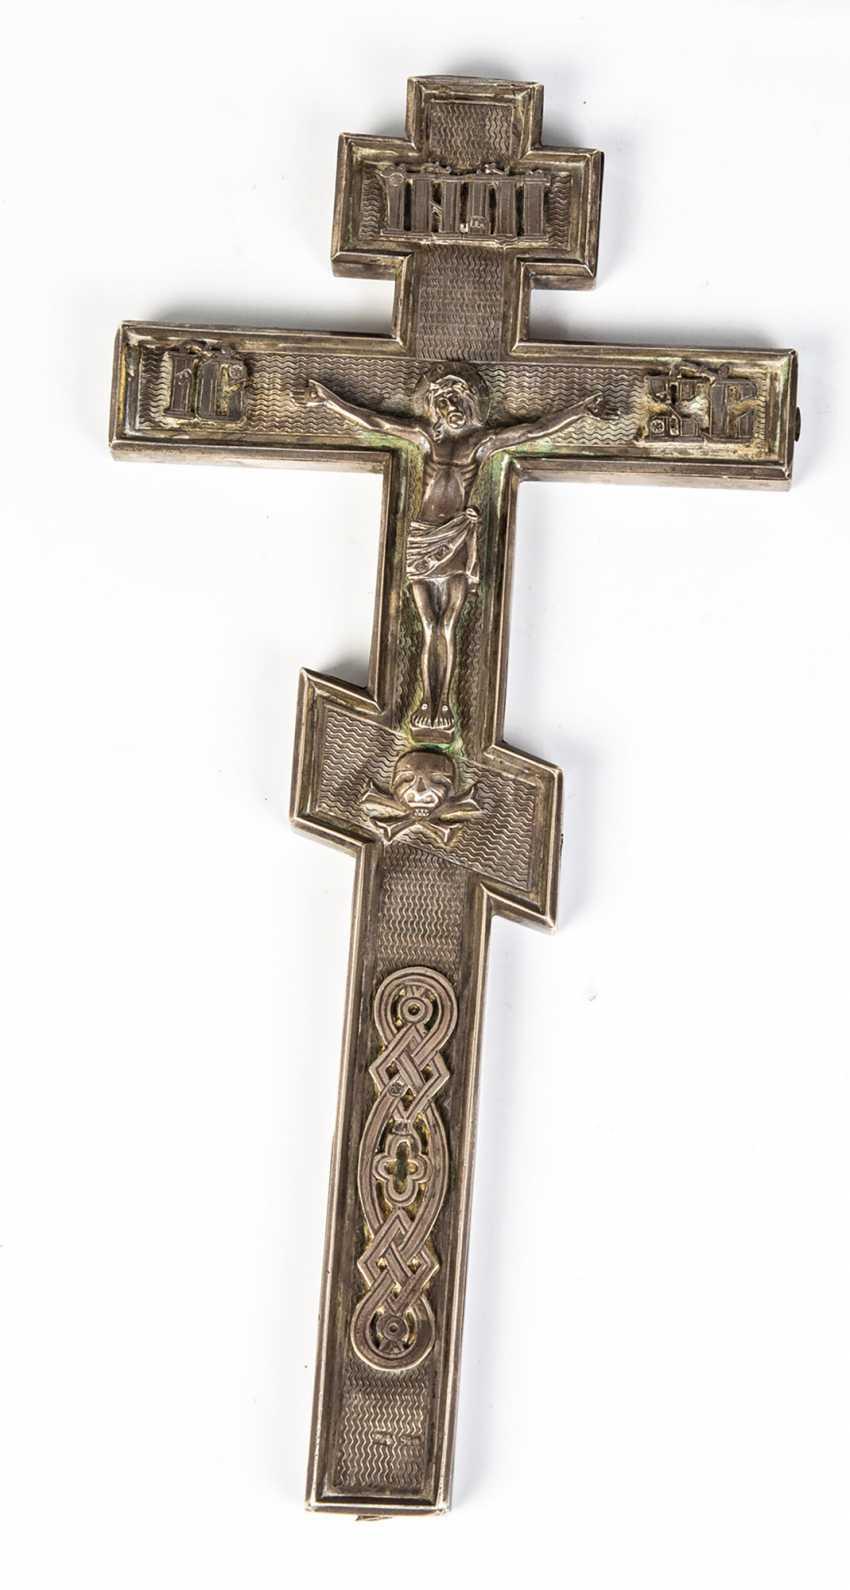 Silberkruzifix - photo 1